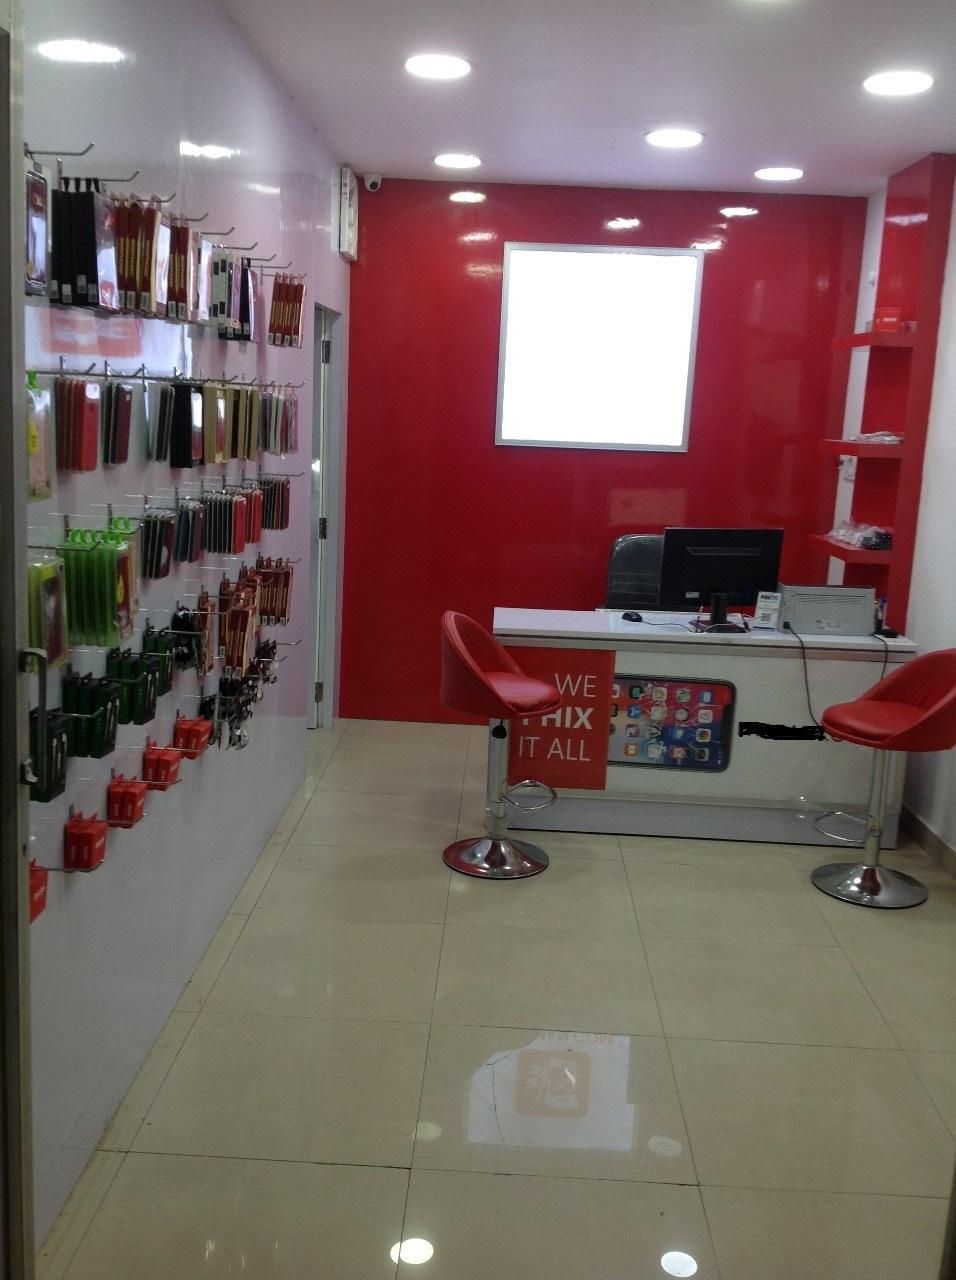 Online Mobile Service Center Franchise for Resale in Bhopal